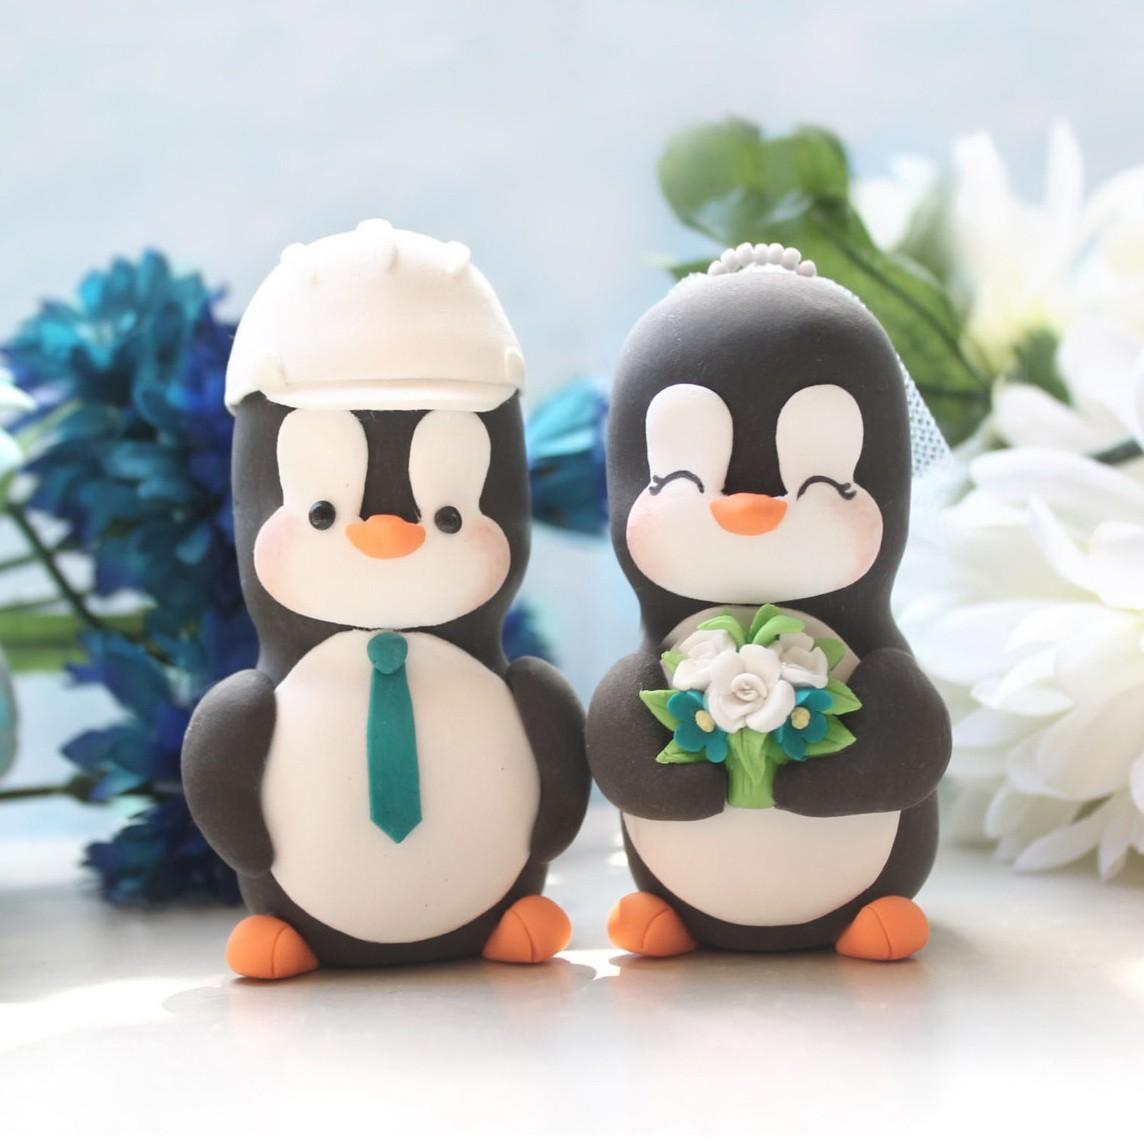 Custom Penguin Love Bird Wedding Cake Toppers With Construction Hard Hat